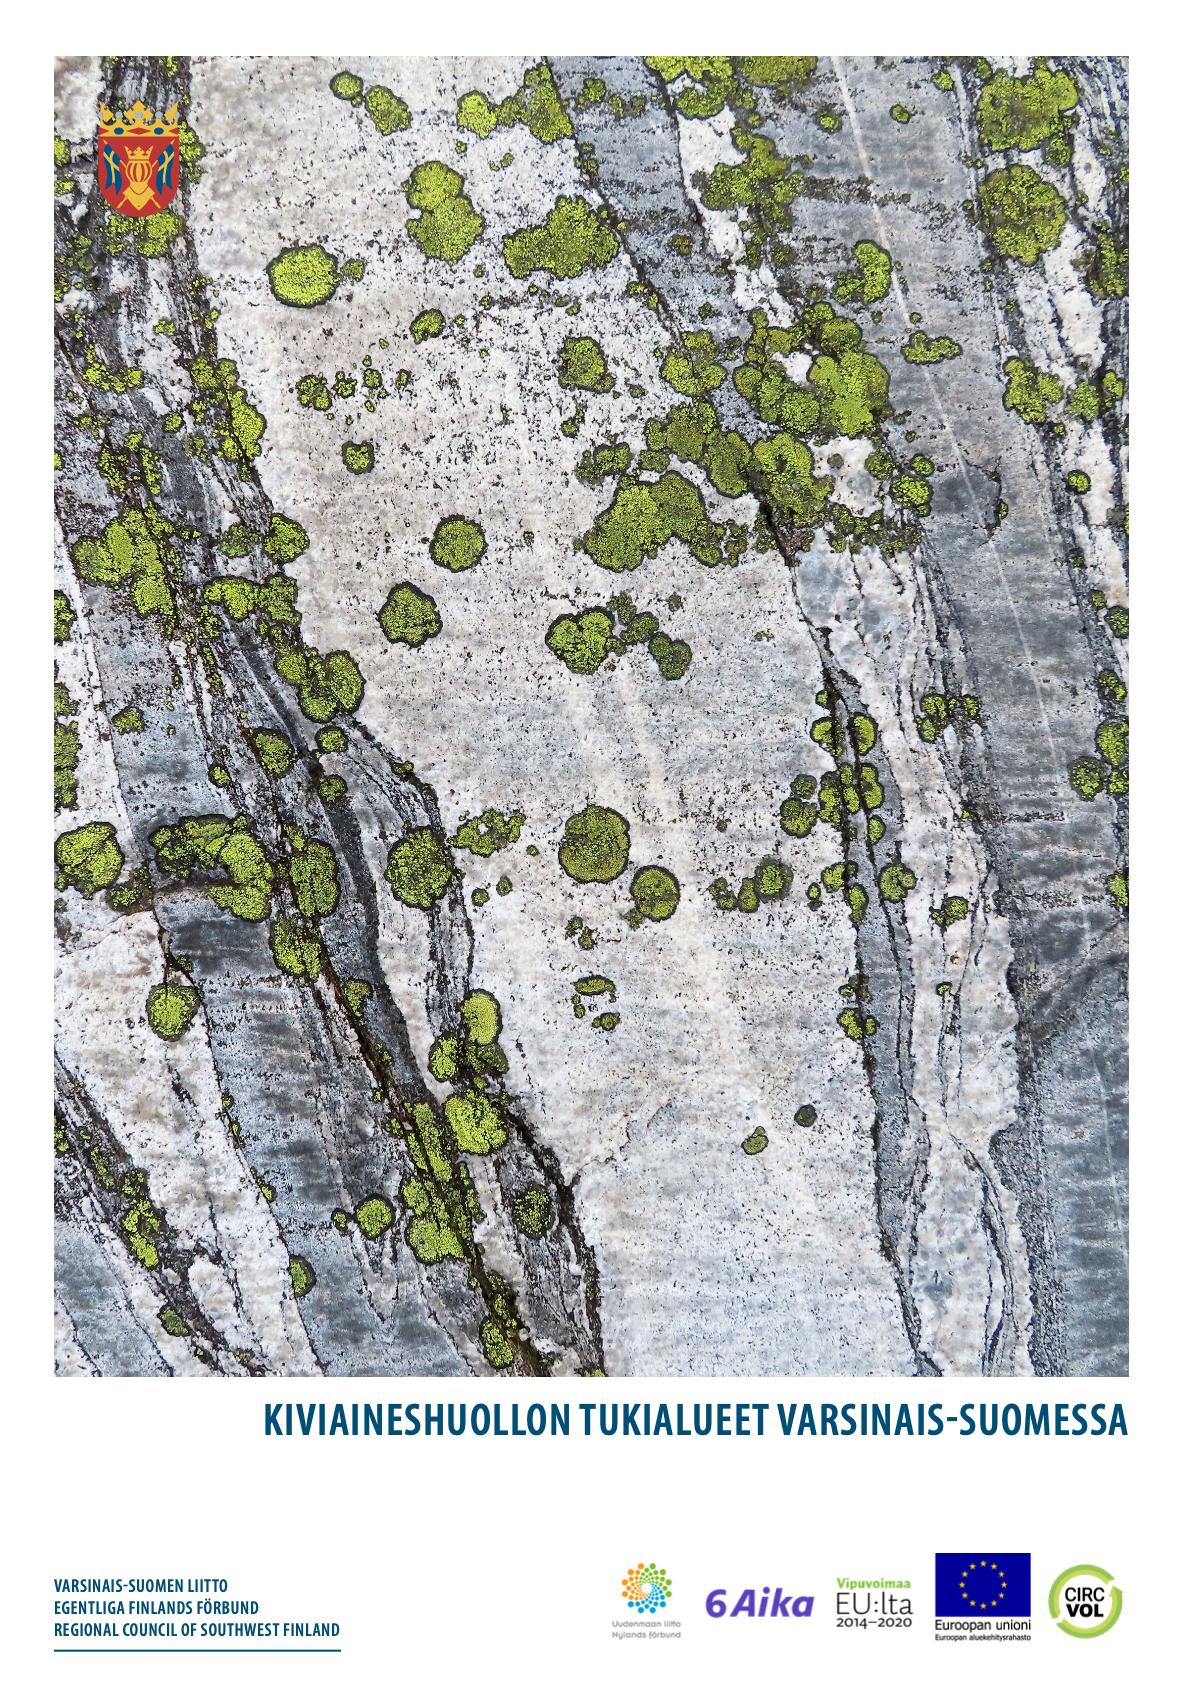 Cover for article 'Kiviaineshuollon tukialueet Varsinais-Suomessa'